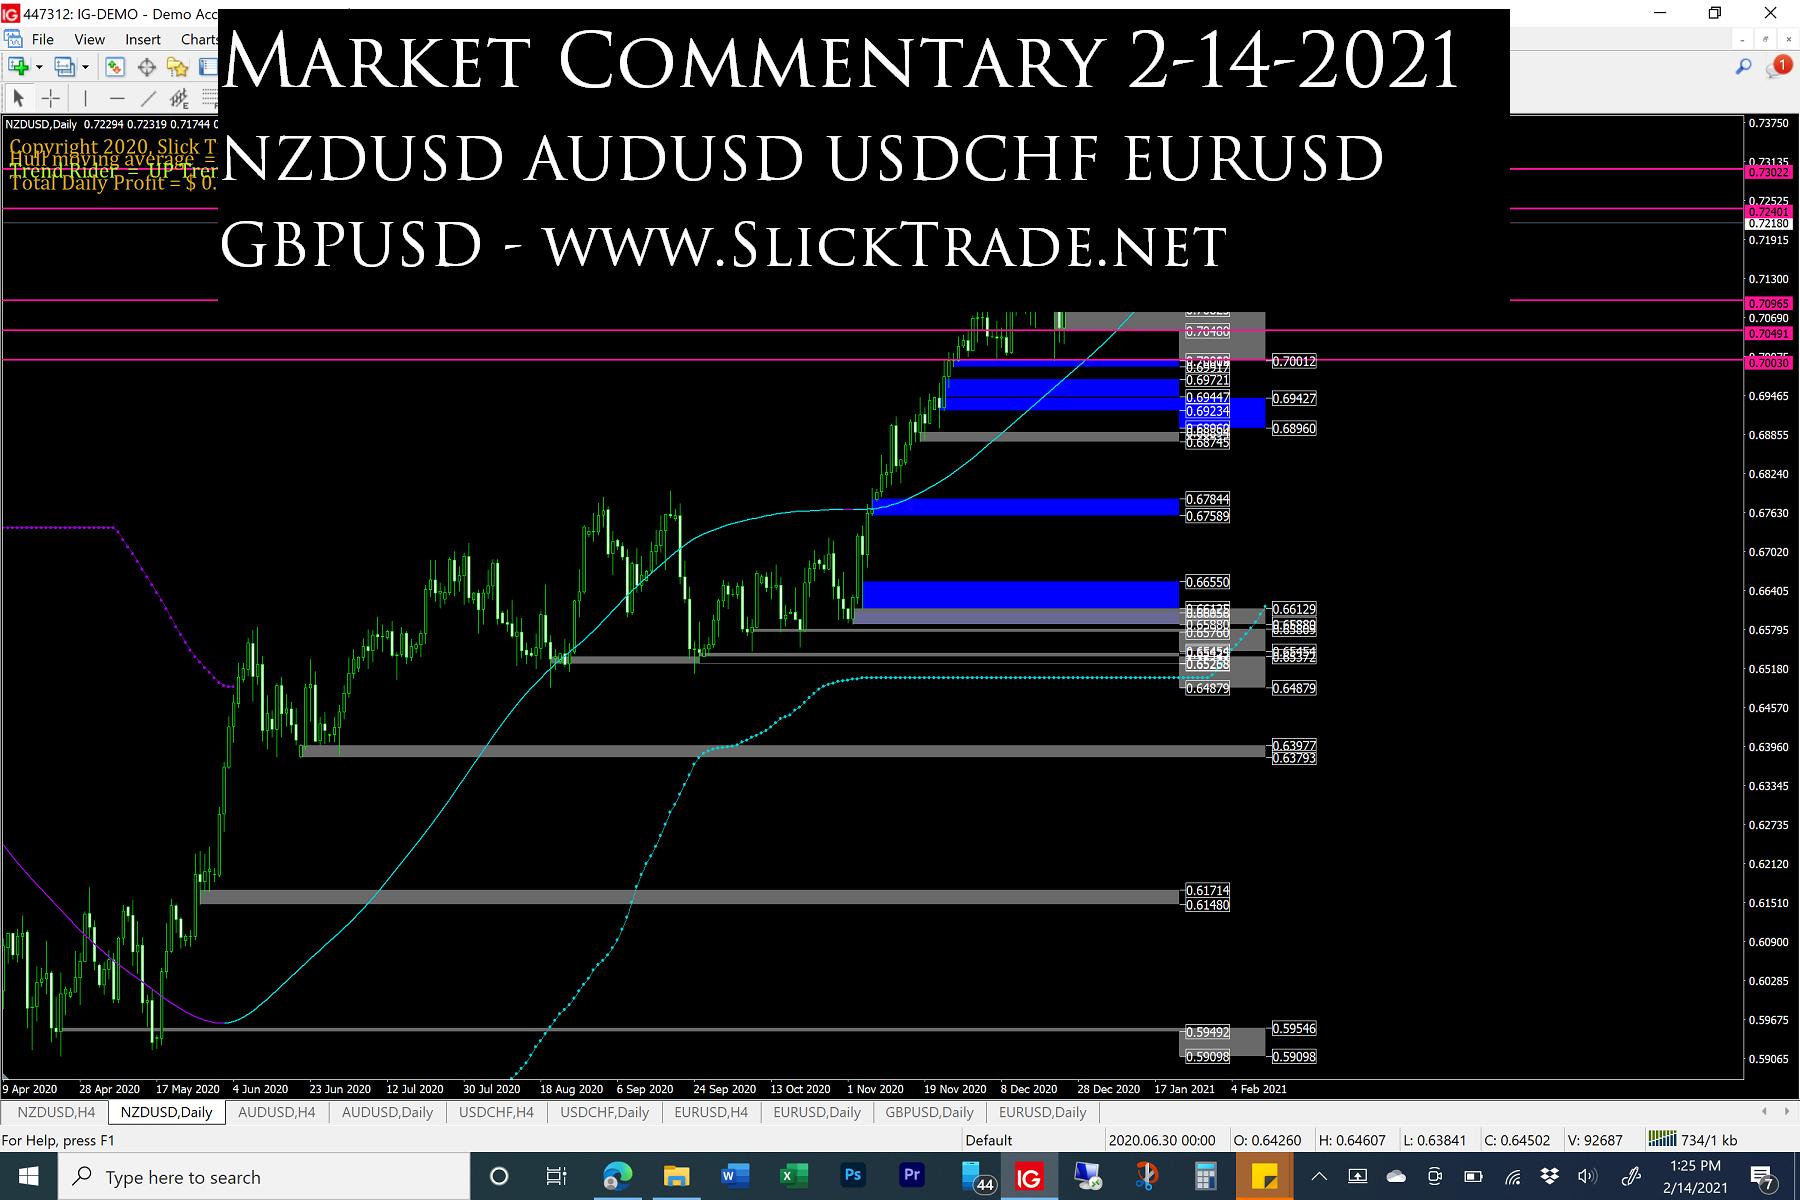 Market Commentary 2-14-2021 - NZDUSD AUDUSD USDCHF EURUSD GBPUSD